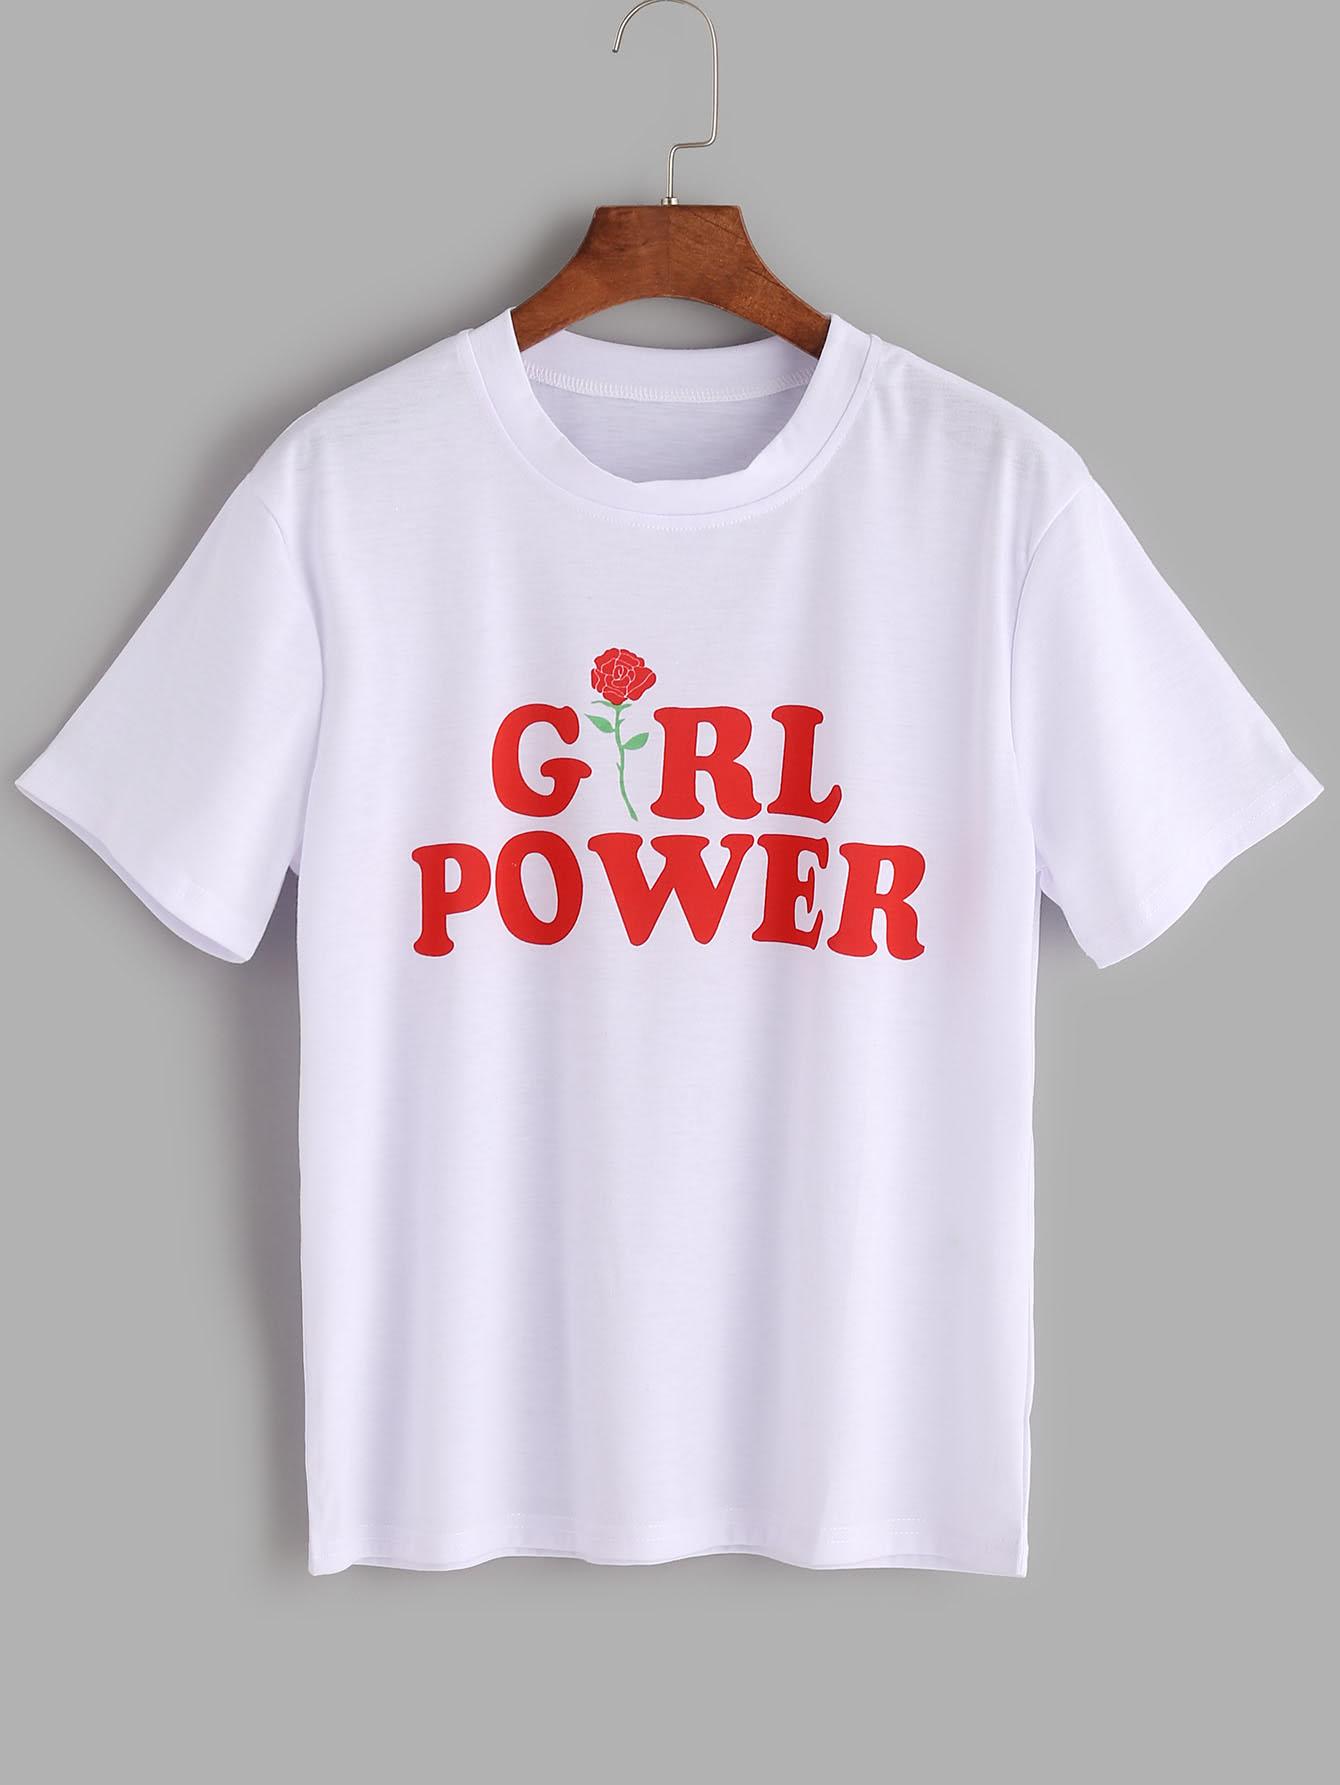 Shop Letters Print T Shirt Online Shein Offers Letters Print T